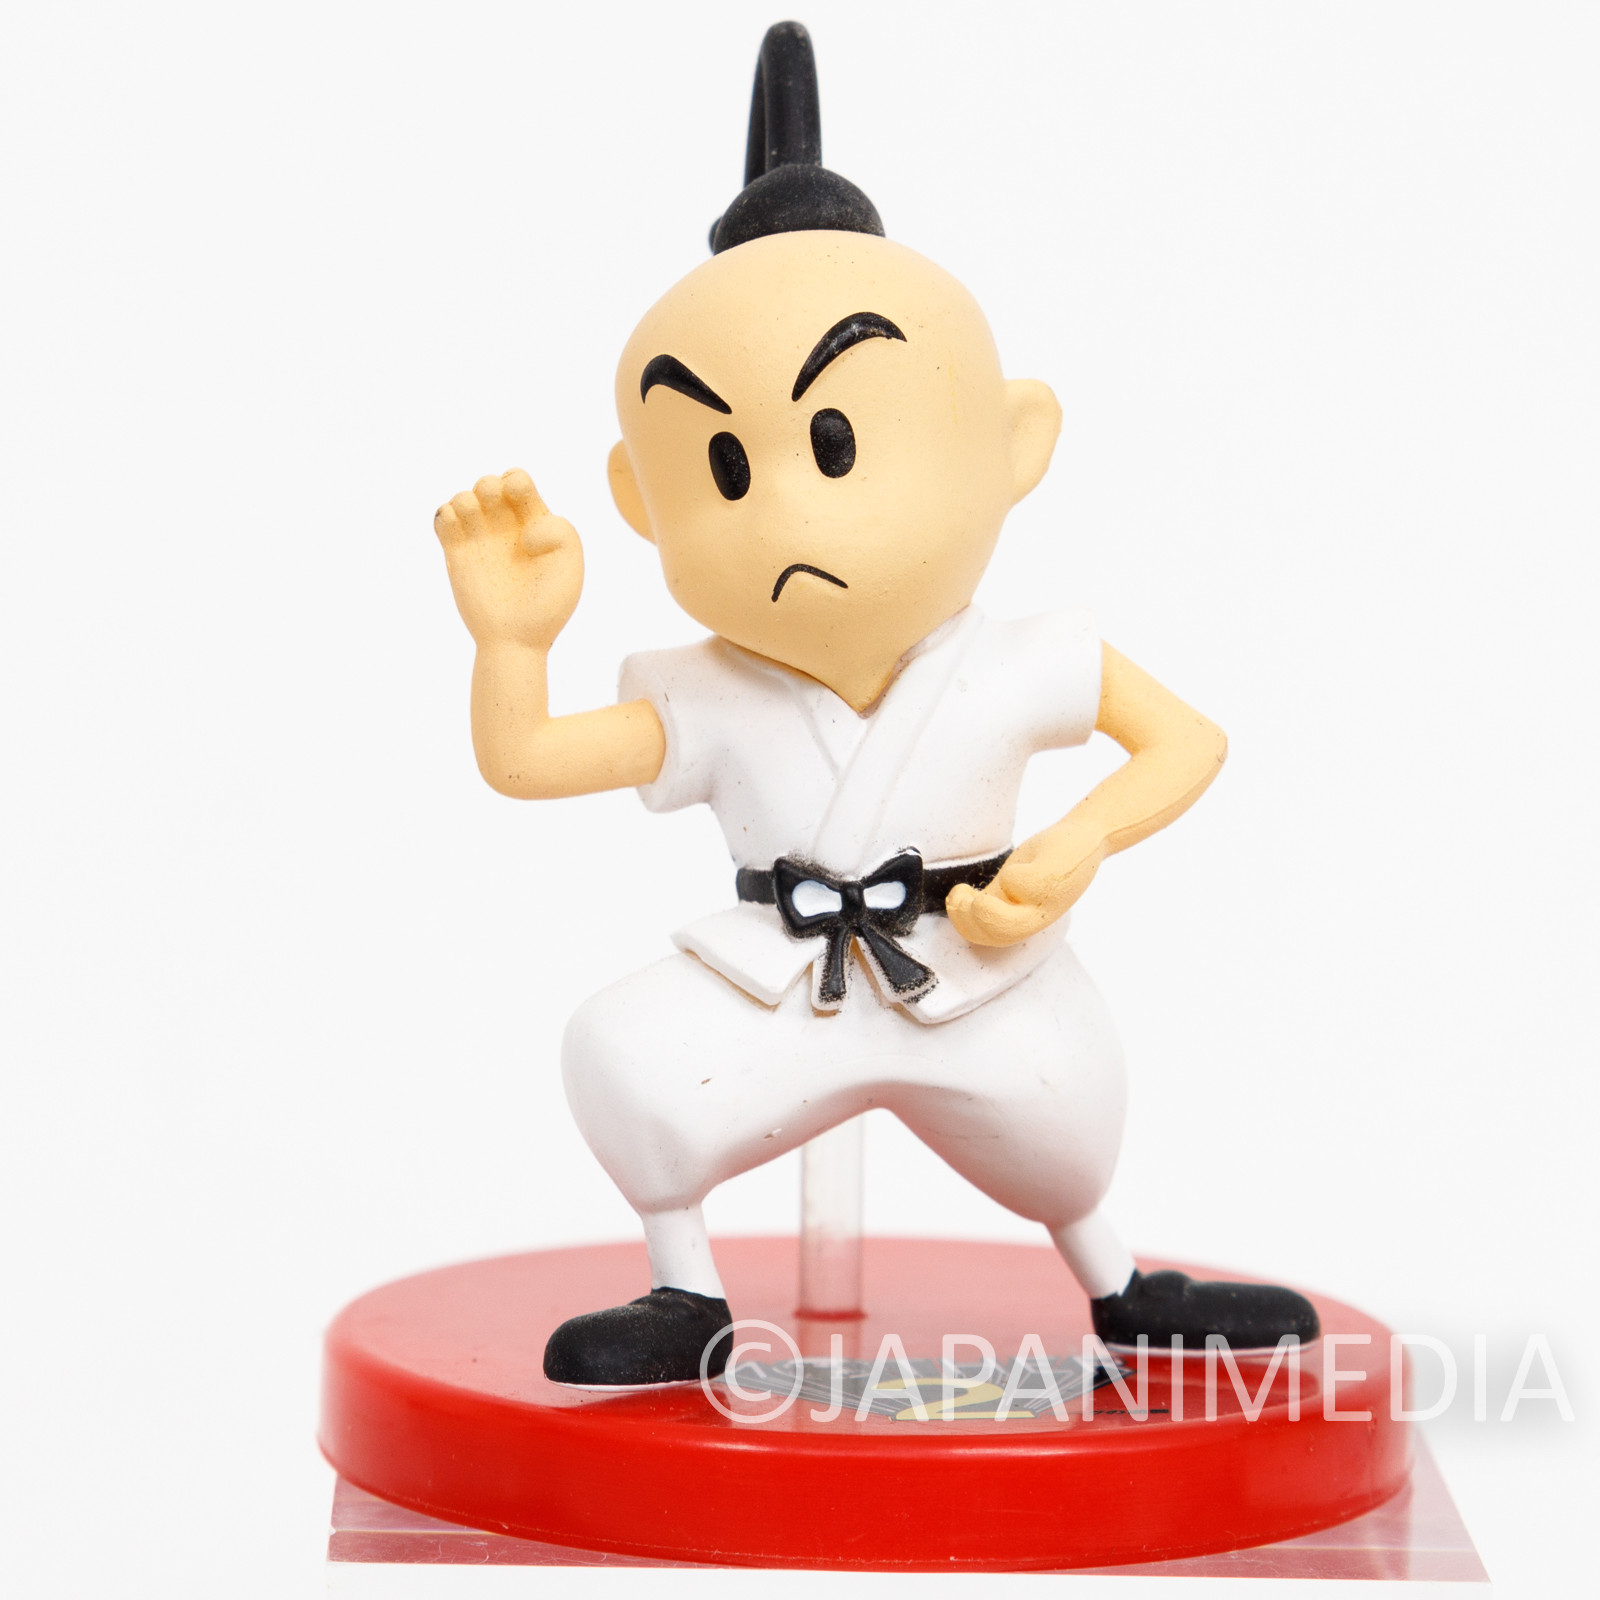 Mother 2 Poo Stand Figure Takara Tomy Nintendo JAPAN GAME NES FAMICOM